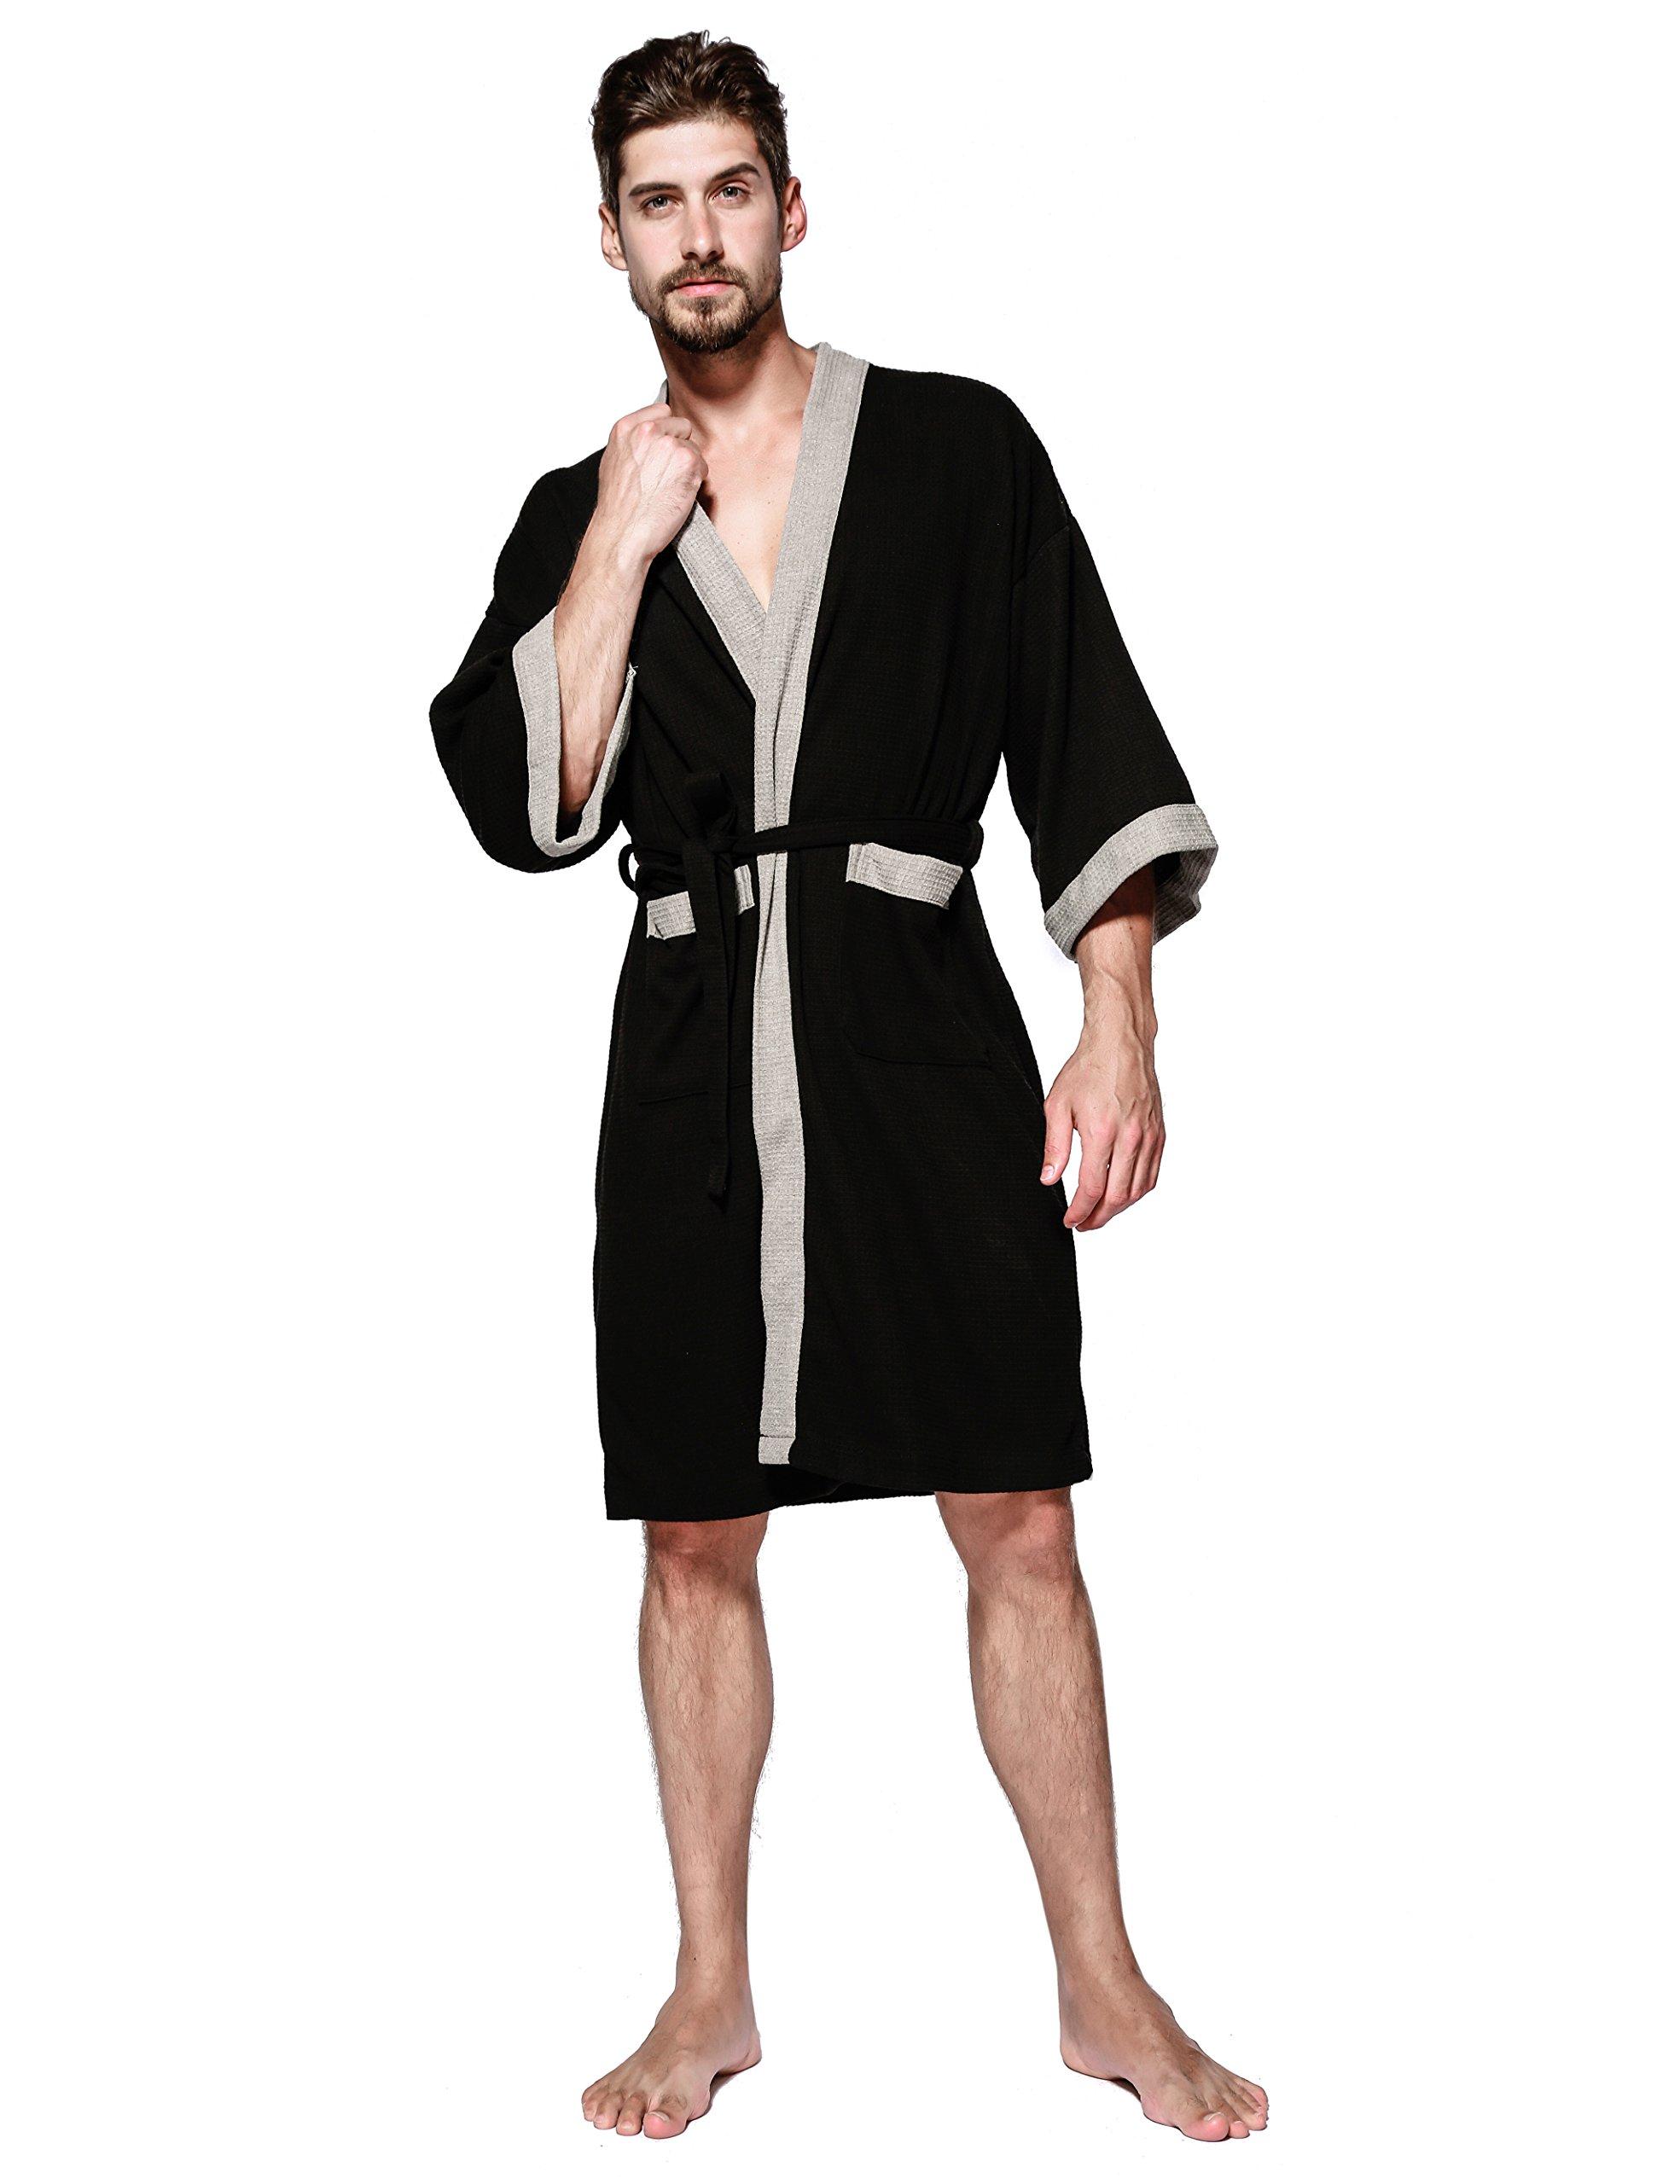 Men's Kimono Robe Cotton Spa Bathrobe Lightweight Soft Knee Length Sleepwear with Pockets